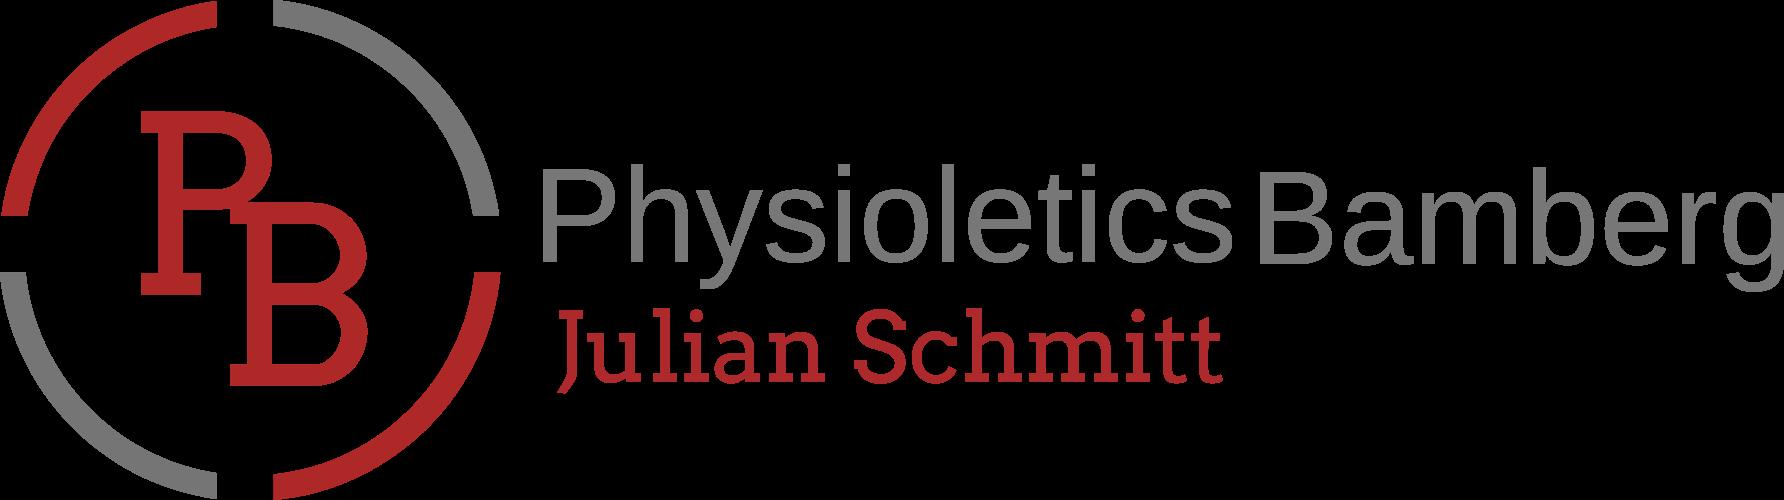 Physioletics Bamberg